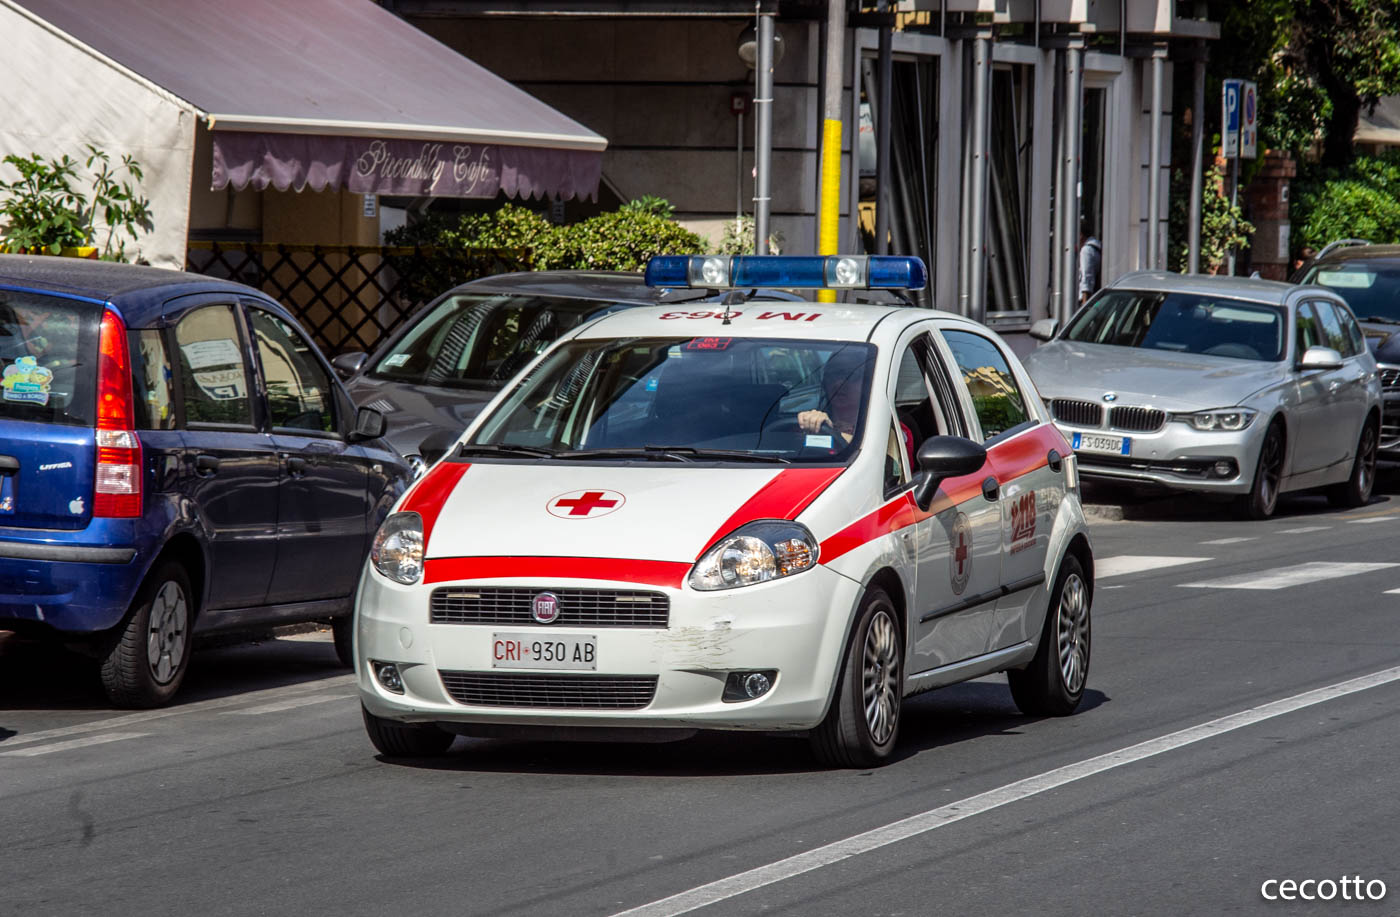 Медицинский автомобиль на базе Fiat Punto CRI930AB. Италия, Bordighera